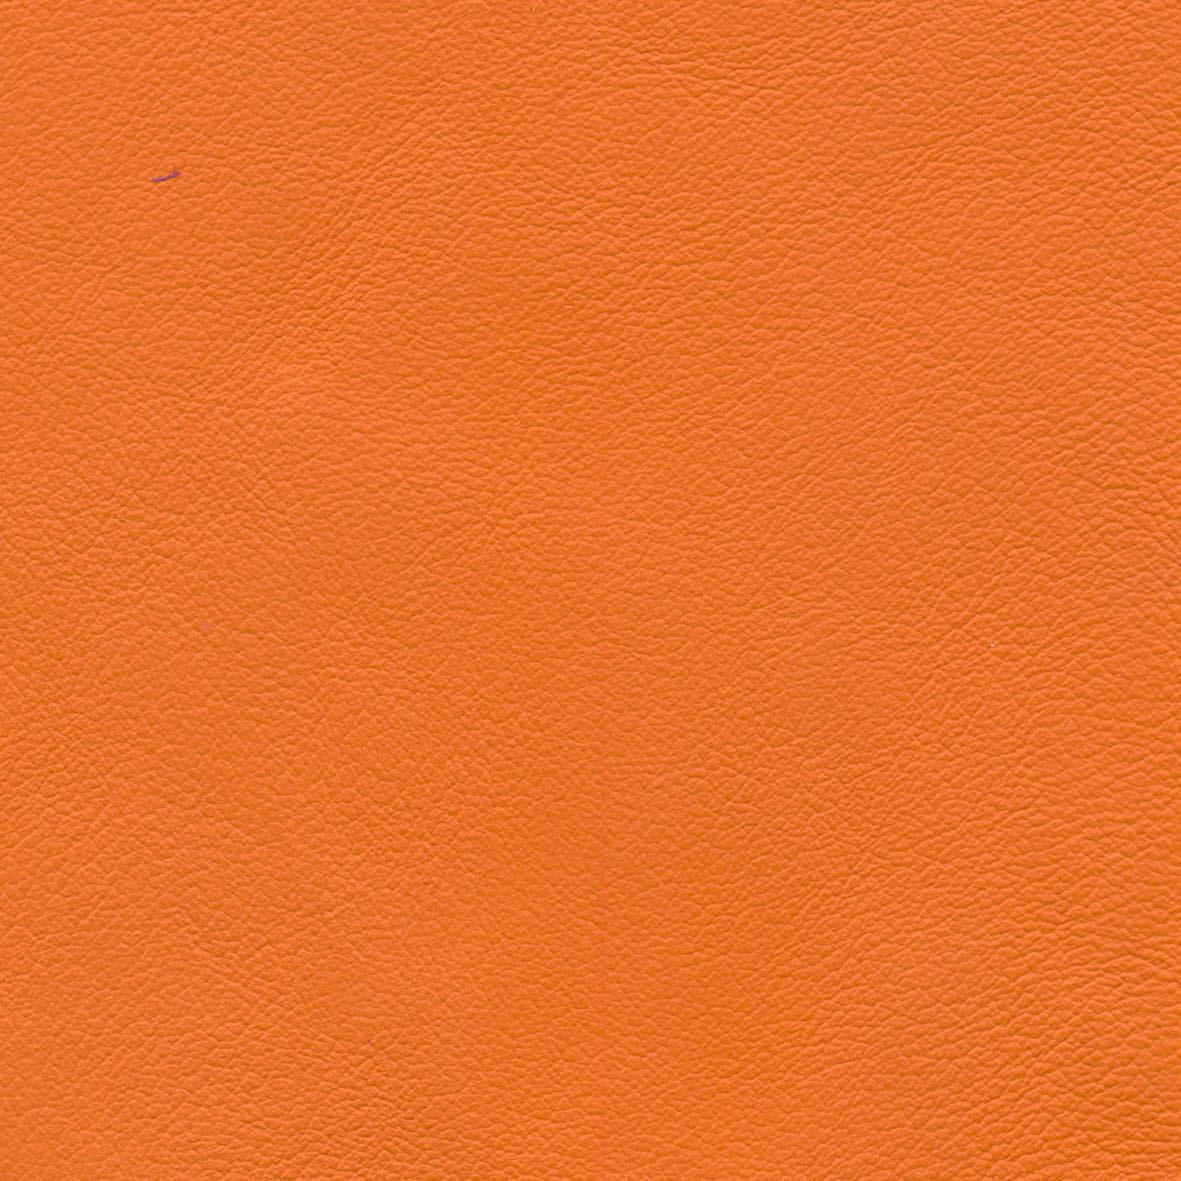 Кожзам оранжевый